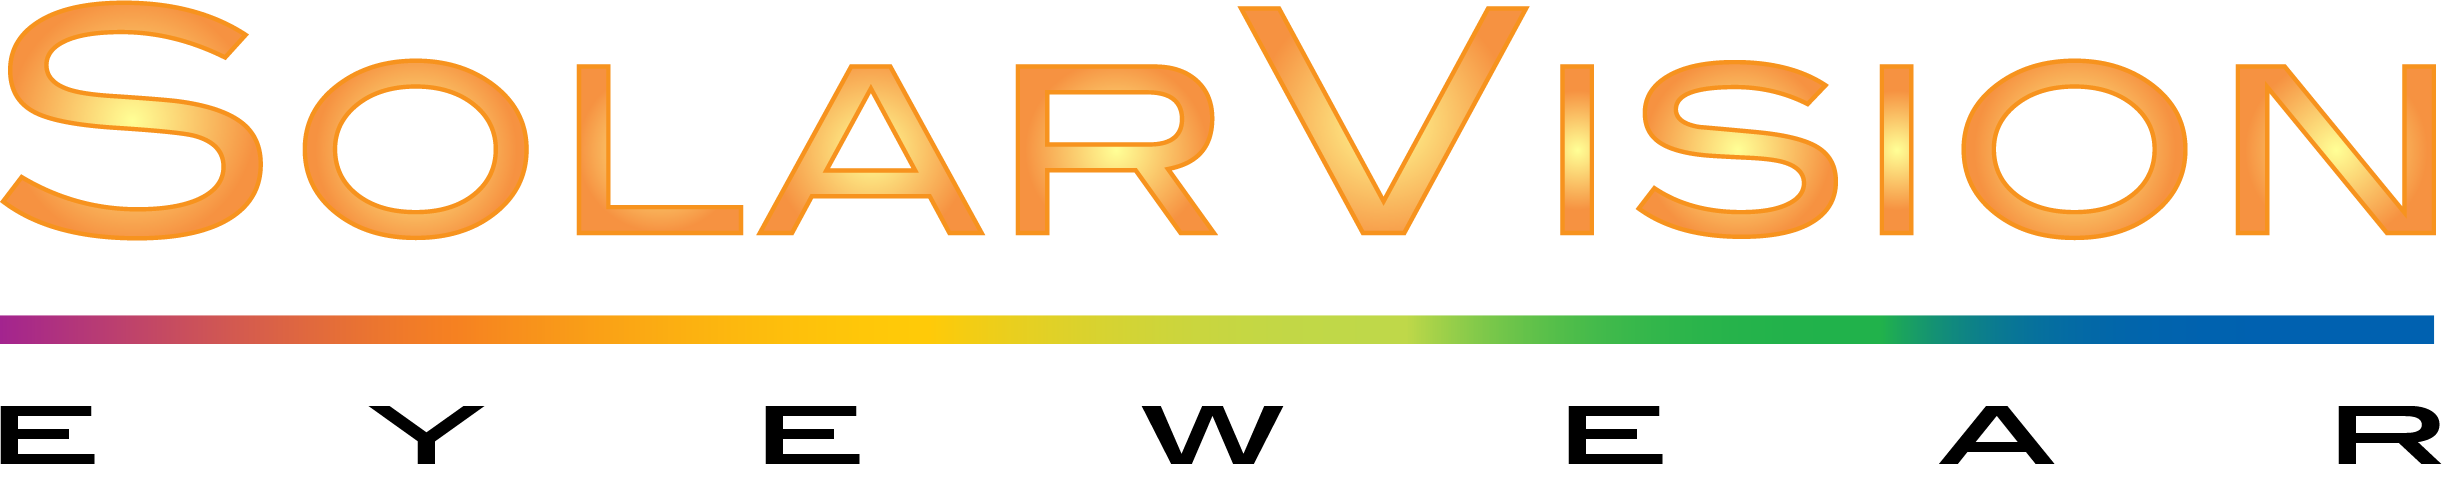 SolarVision-logo-2